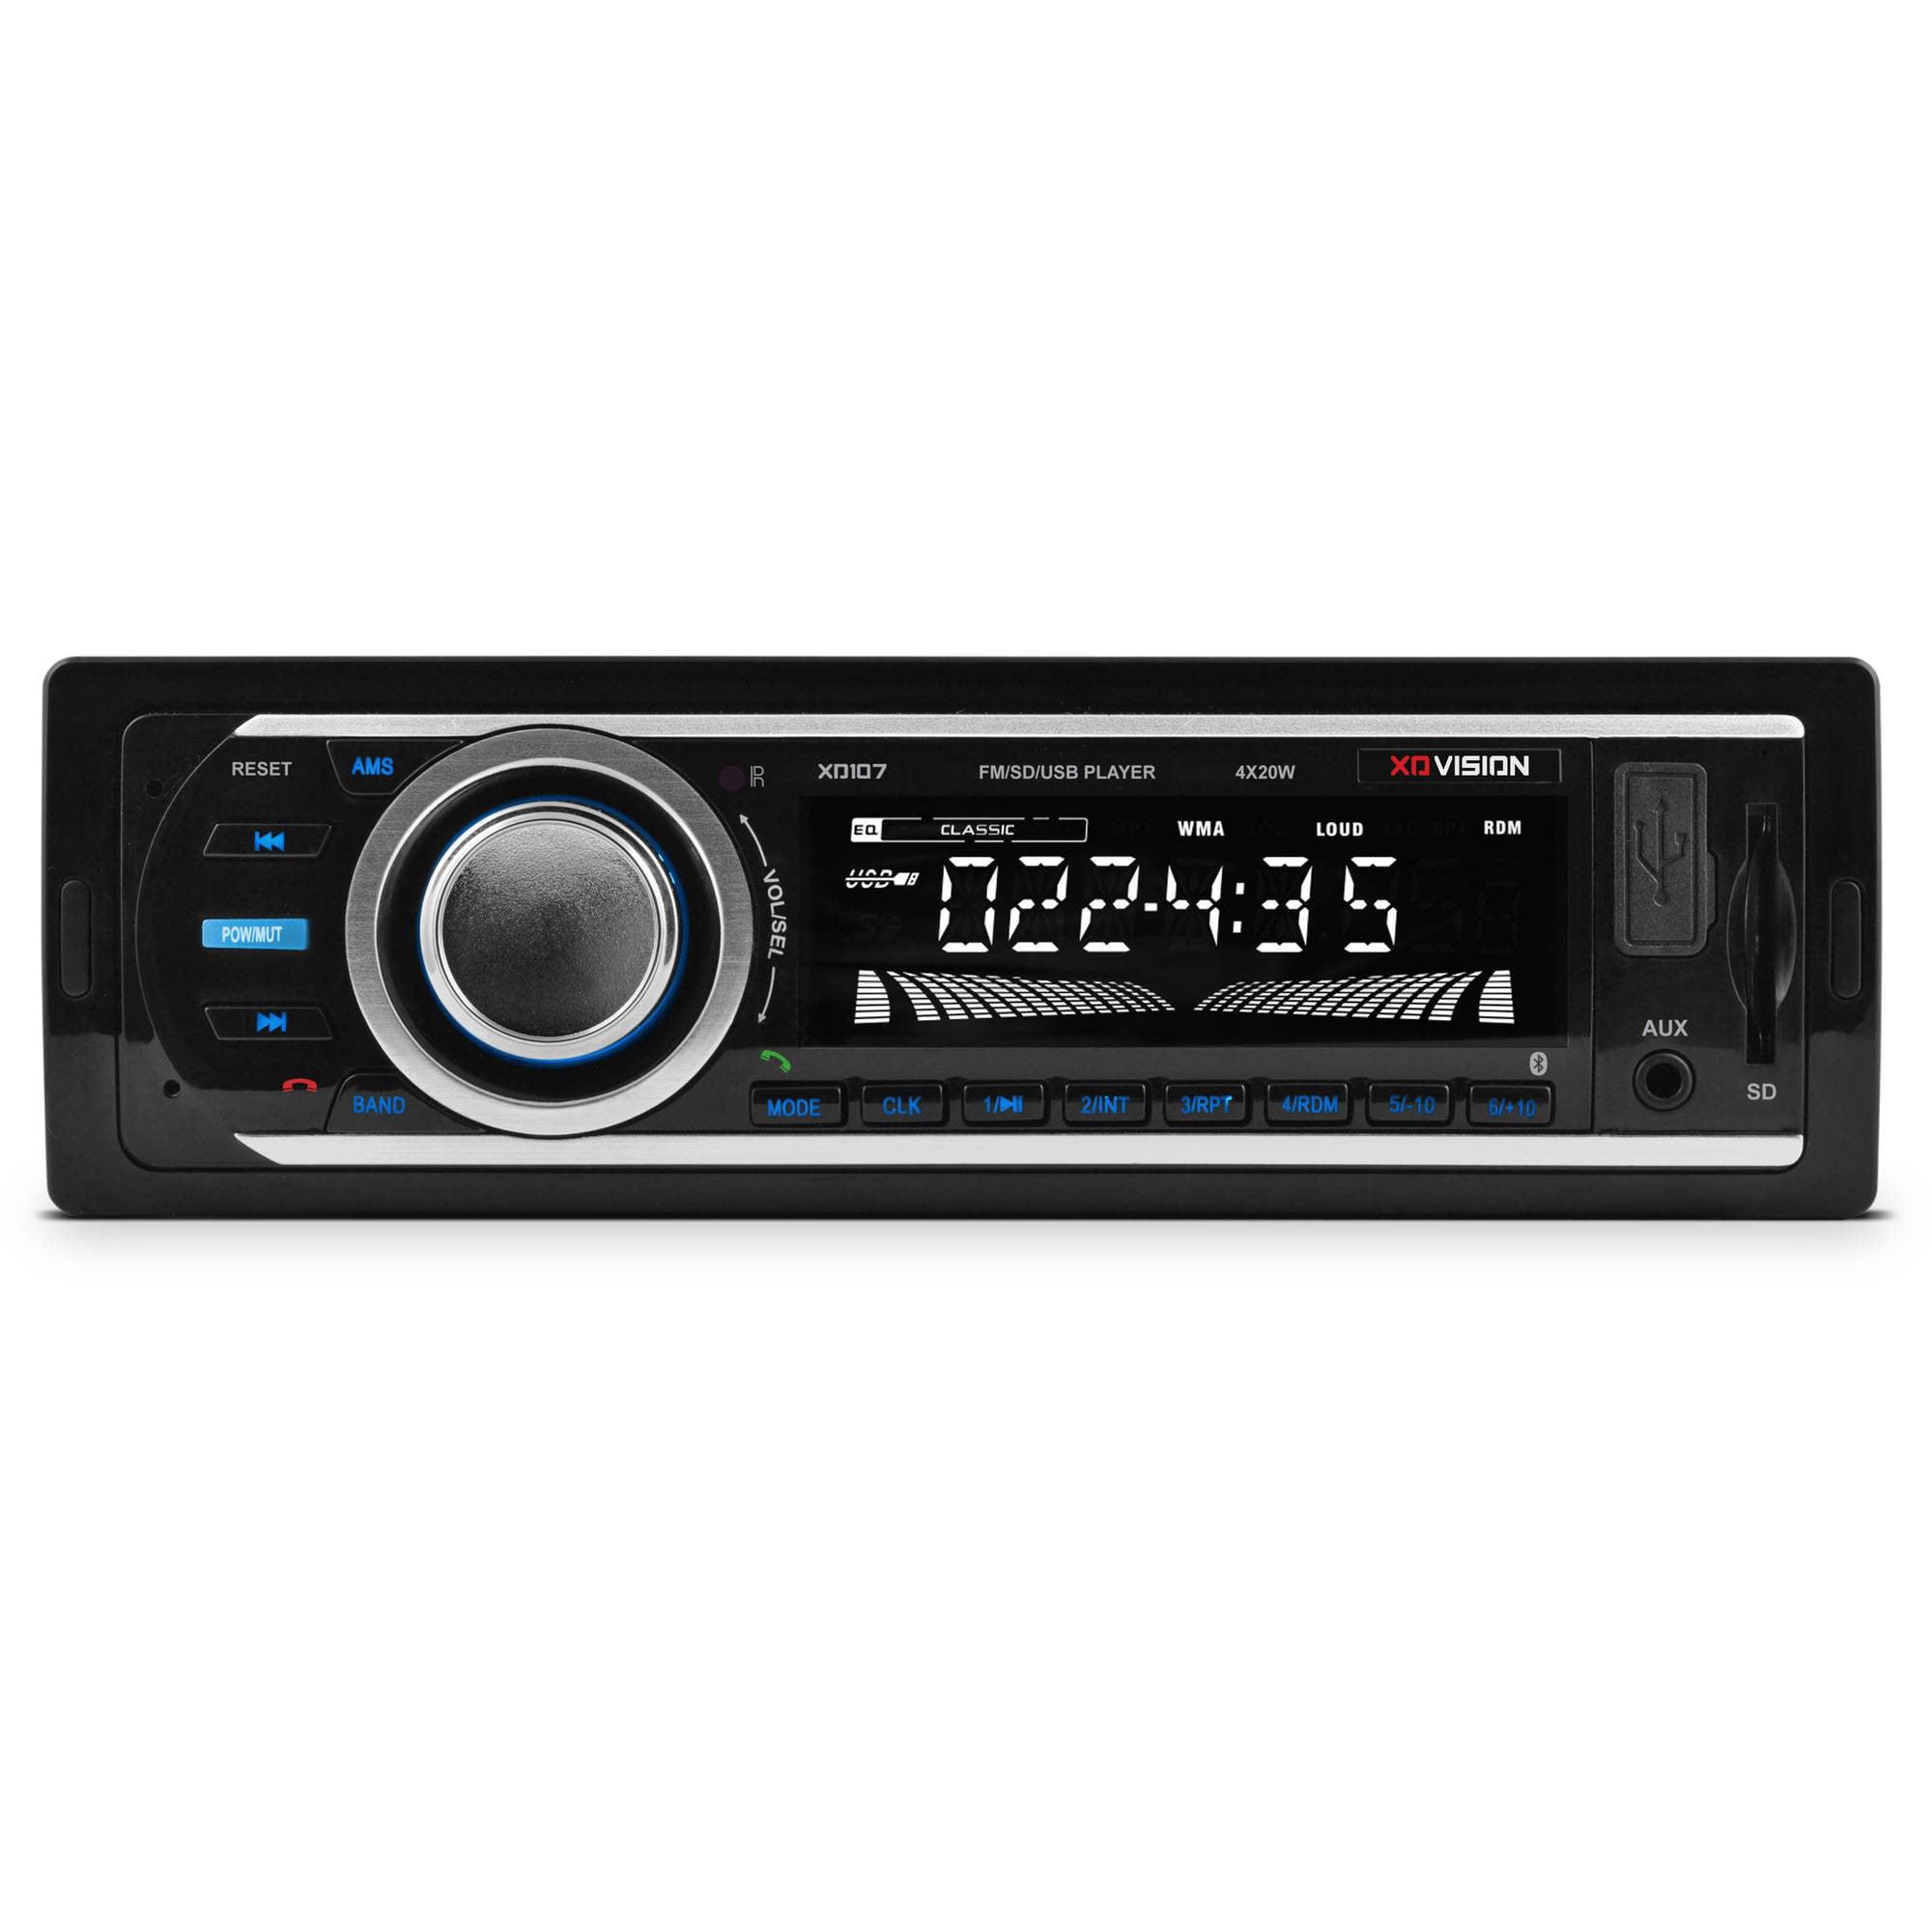 Xo Vision Single-din In-dash Fm/mp3 Digital Media Receiver With Usb/SD -  Walmart.com